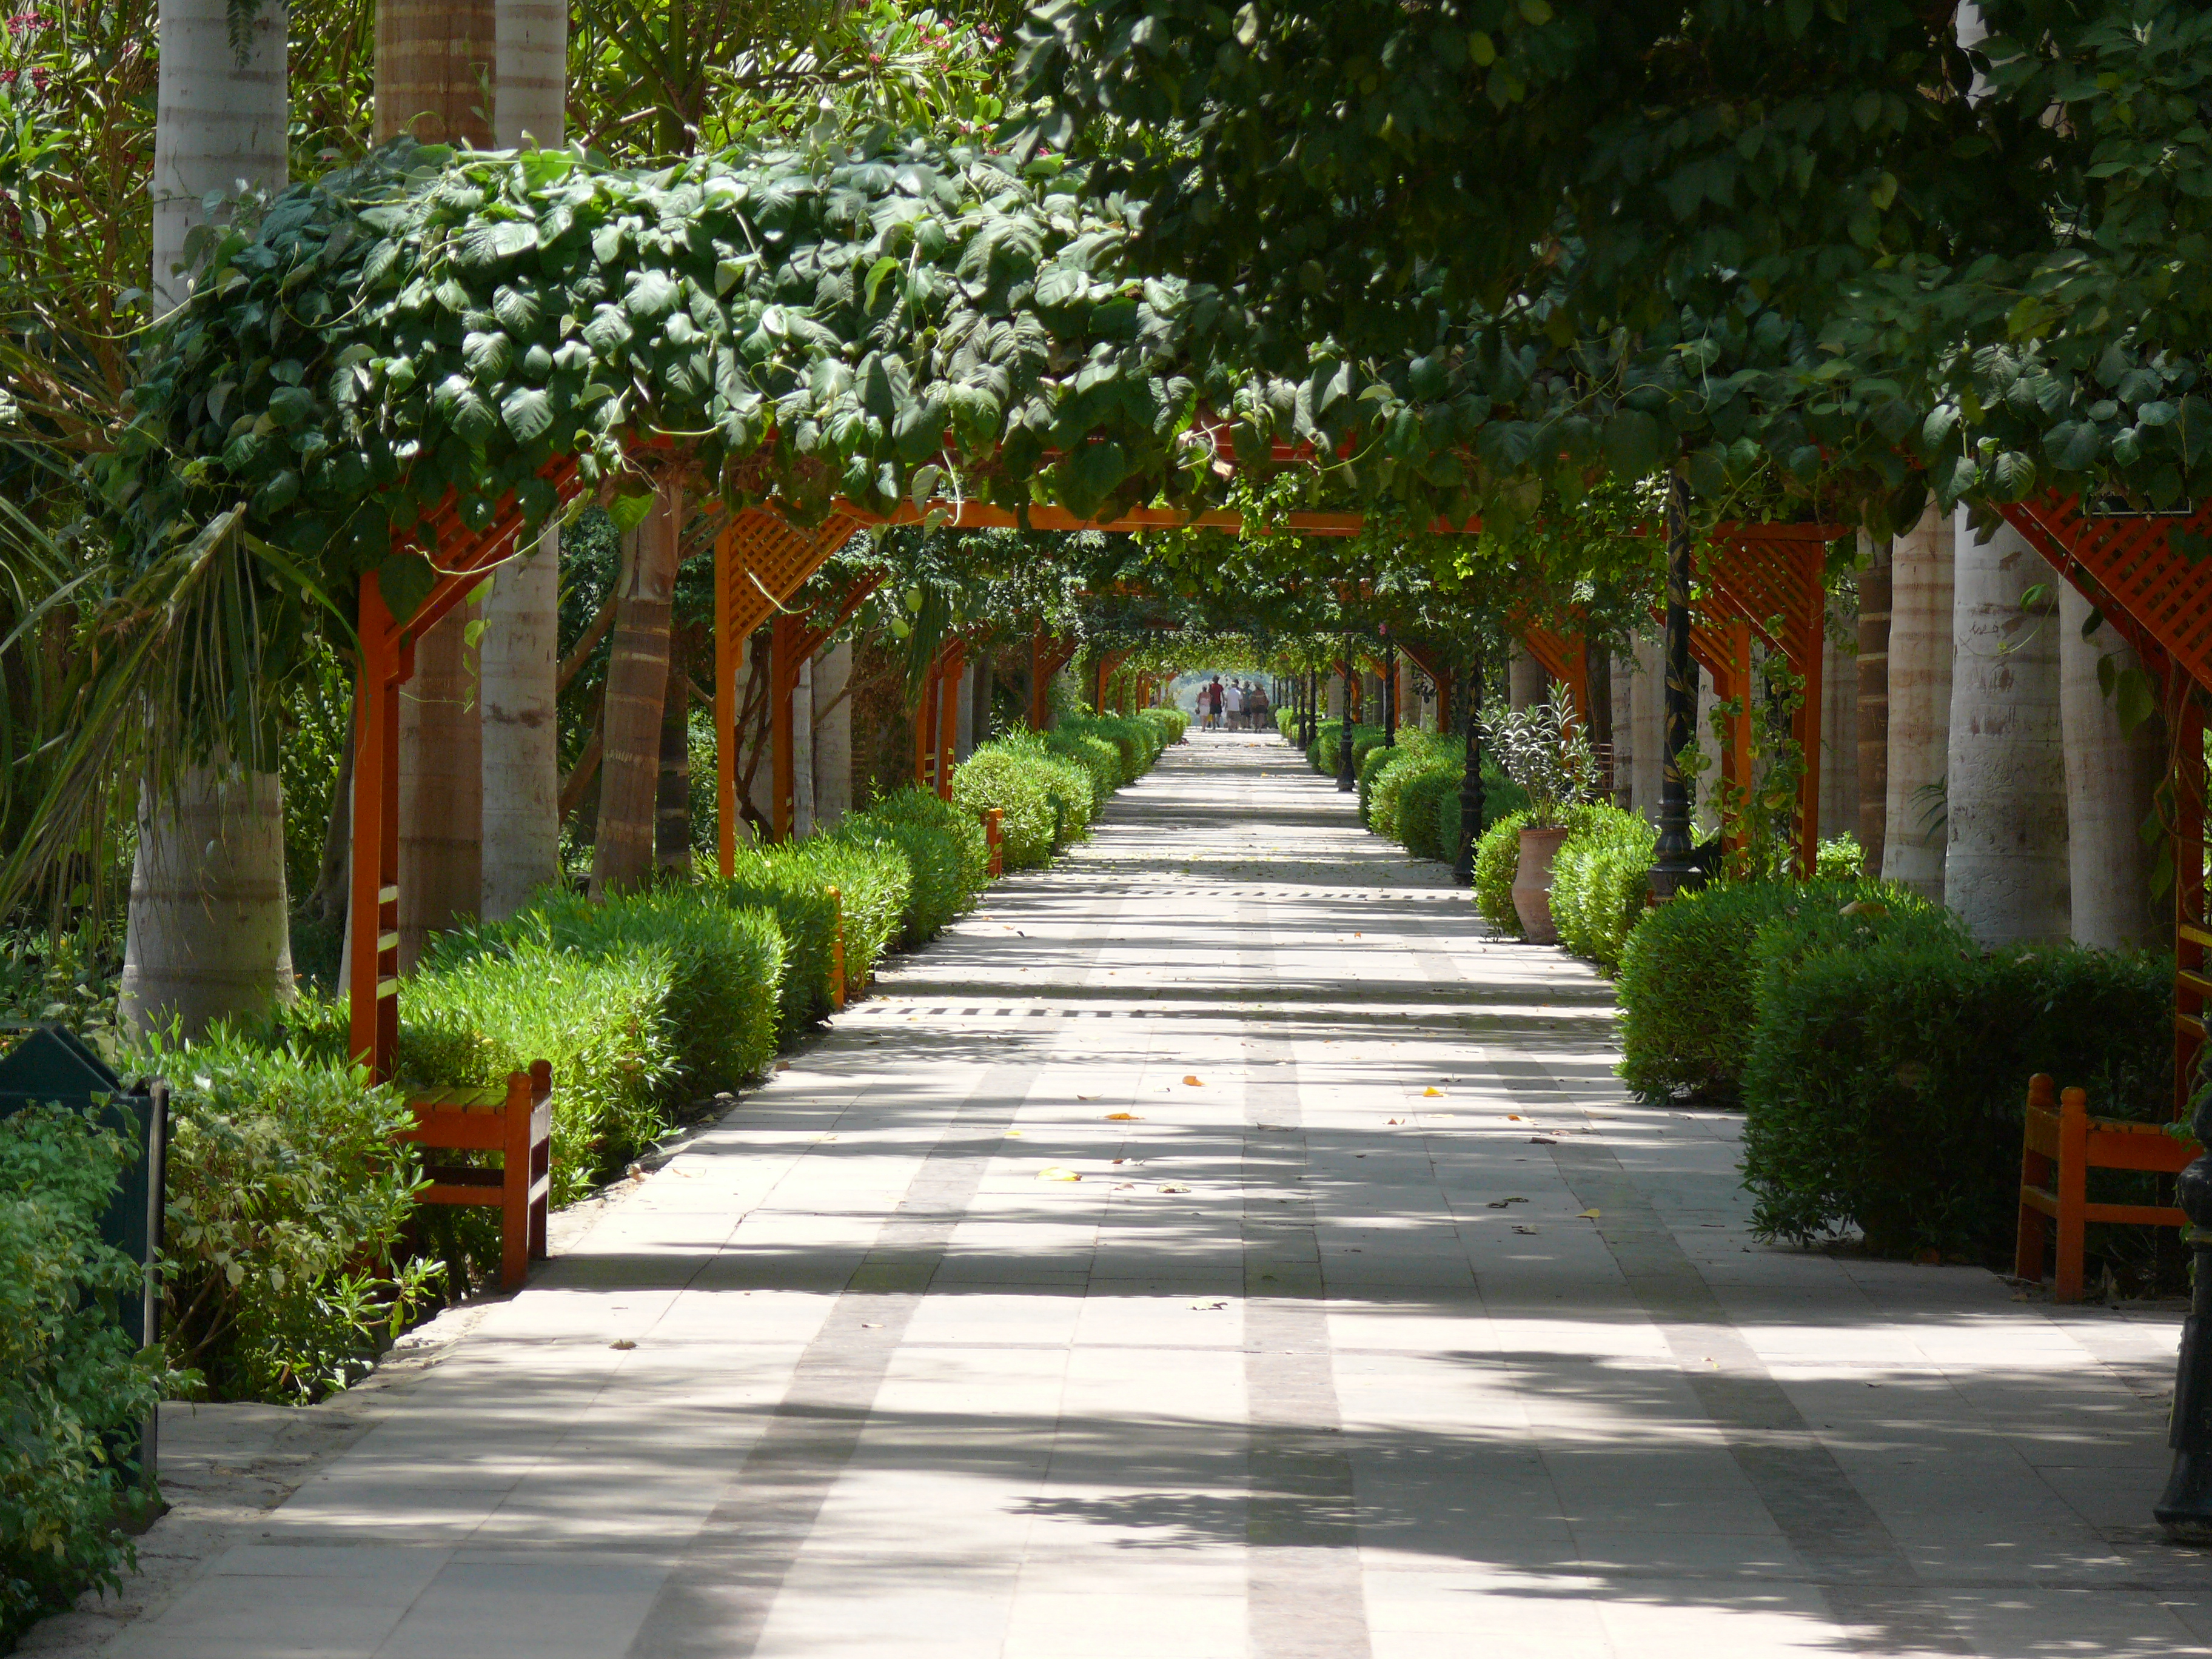 File:Aswan Botanical Garden 001.jpg - Wikimedia Commons